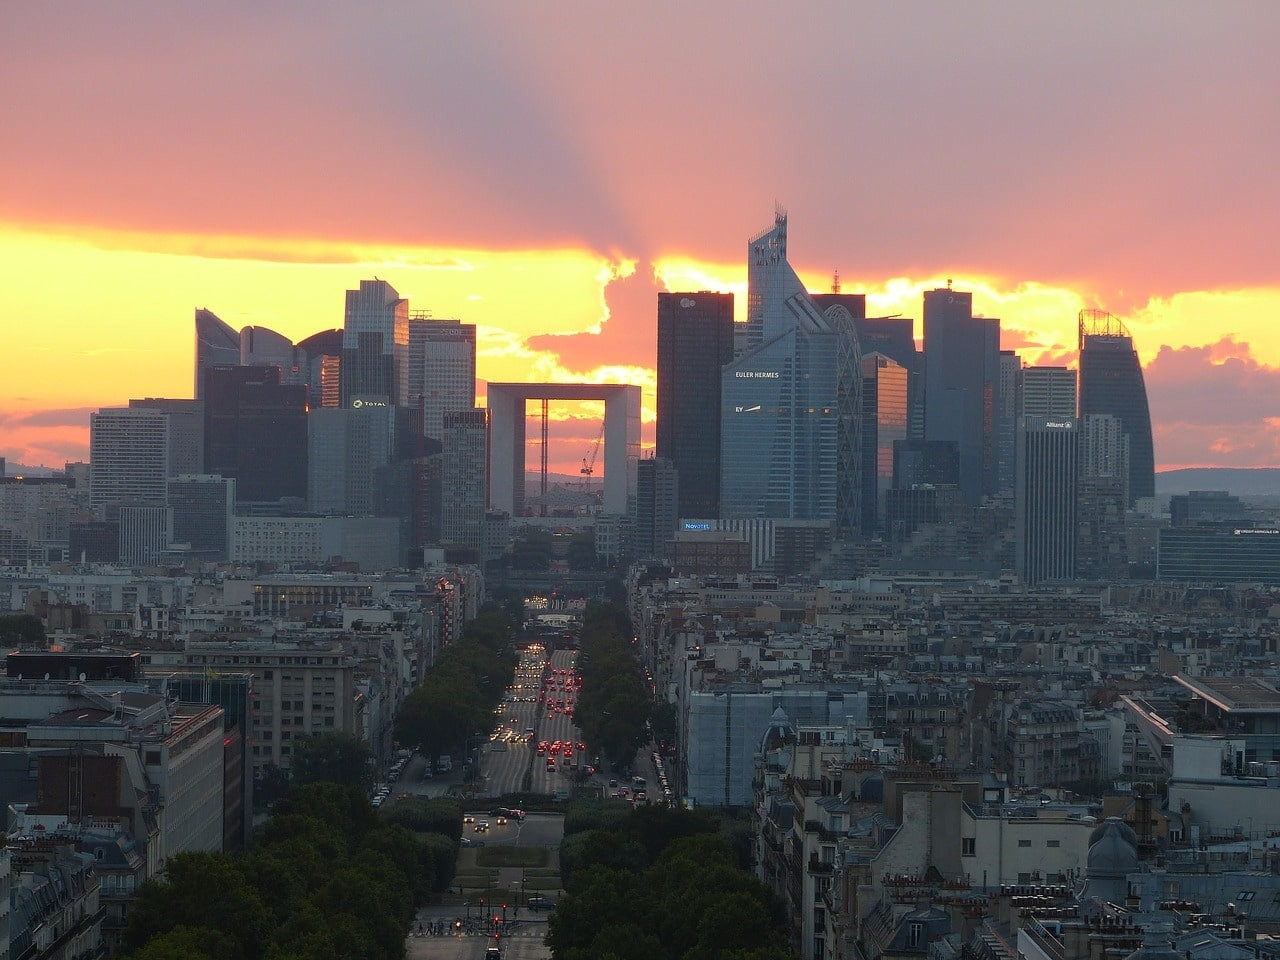 Visita il moderno Quartiere La Défense a Parigi - Parigi.it